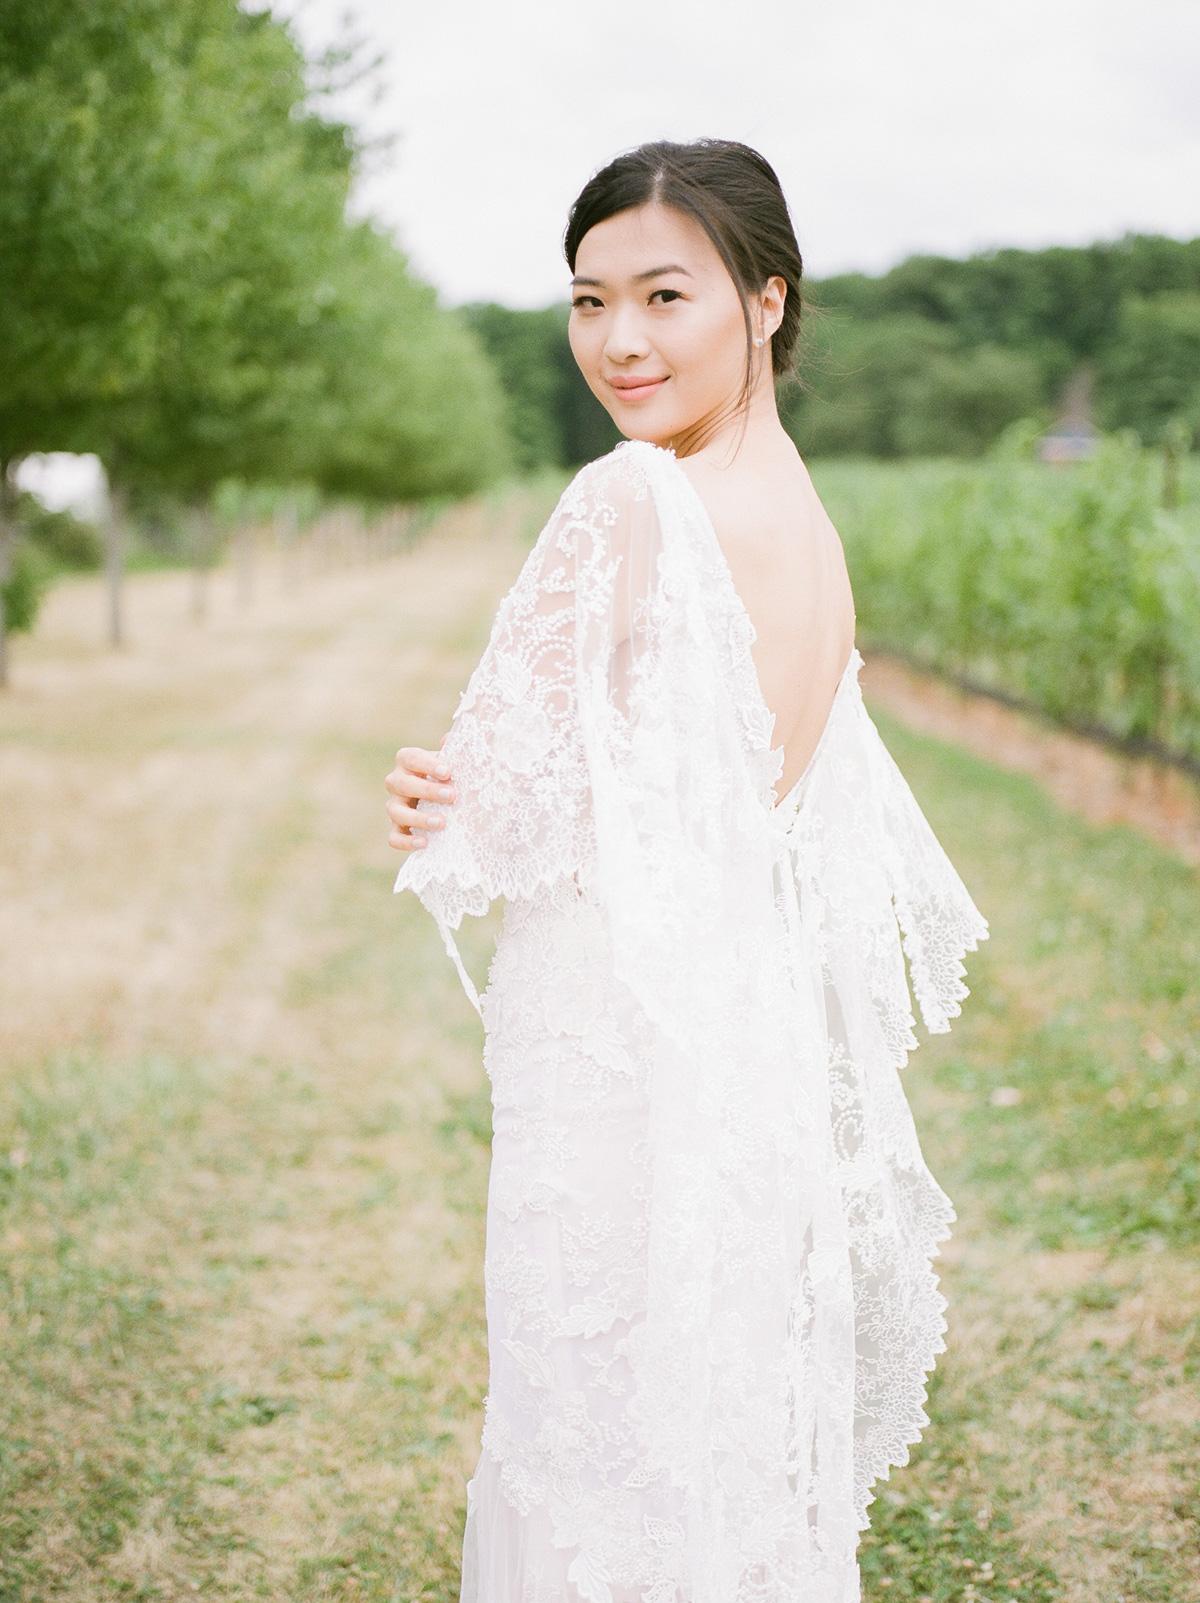 jennifer-xu-photography-vineyard-bride-swish-list-rosewod-eatstes-winery-beamsville-wedding-editorial-1.jpg